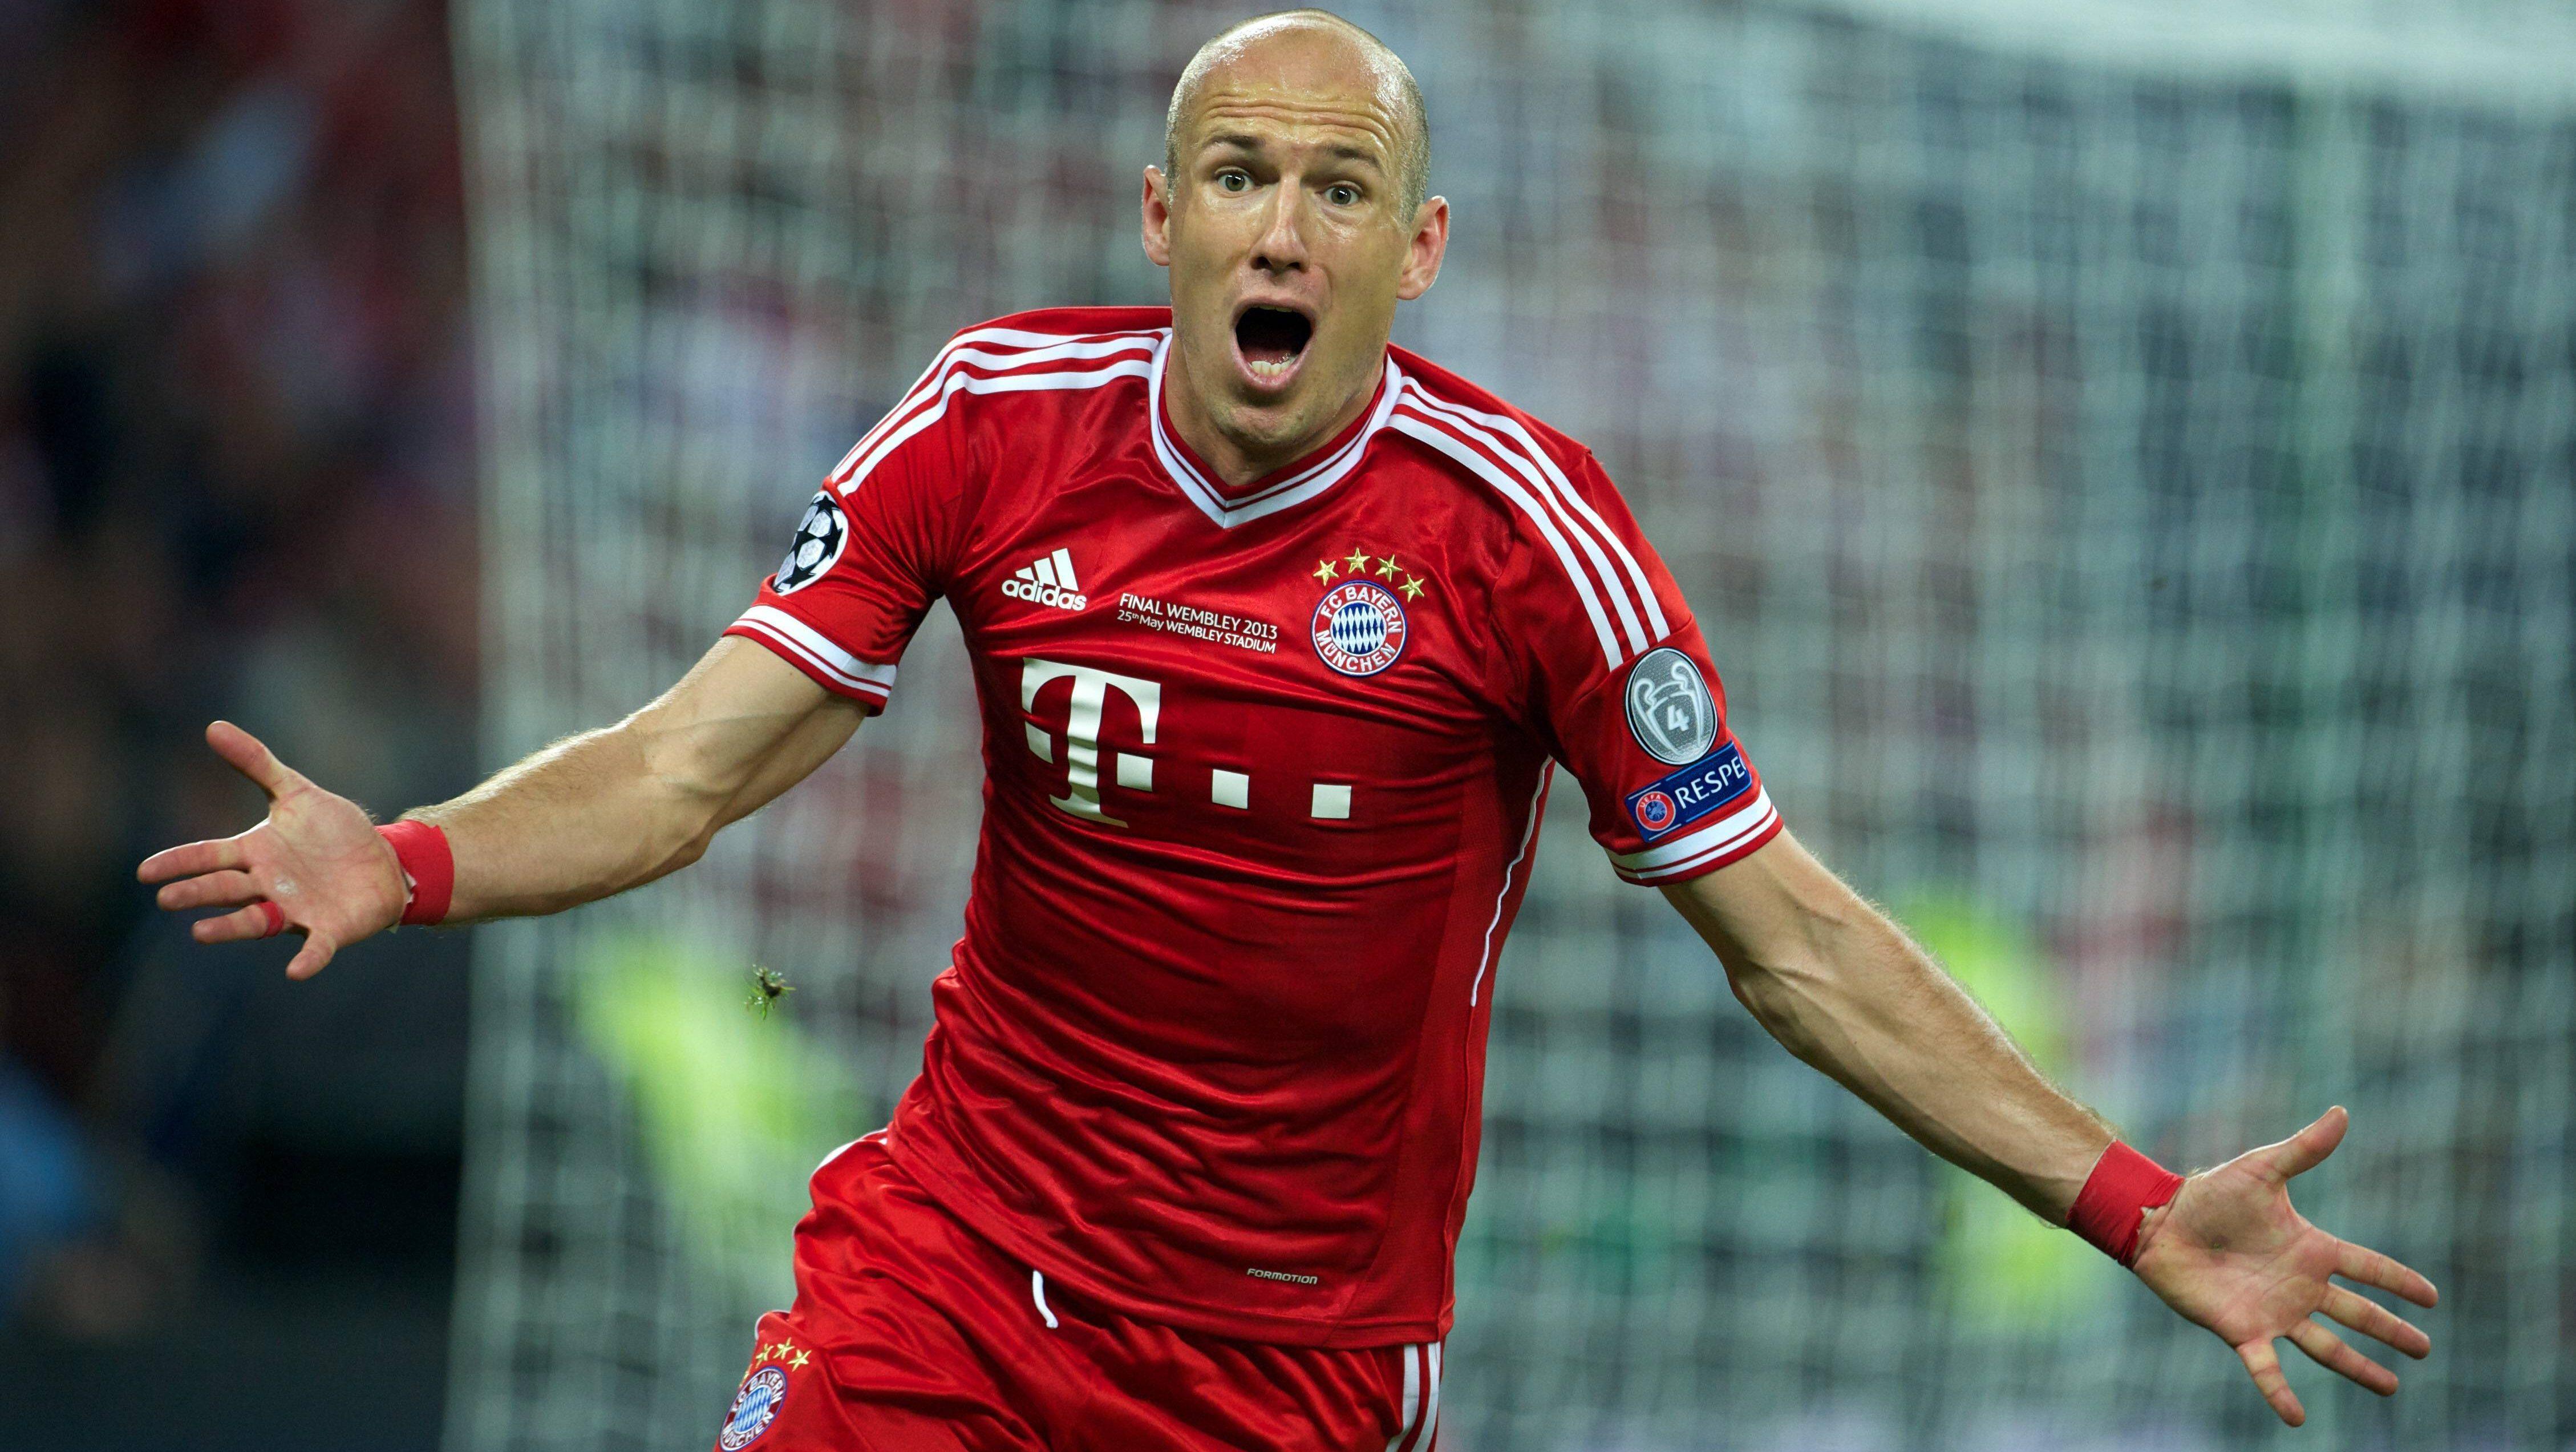 Bundesliga Der Klassiker Remembering The 2013 Champions League Final Between Bayern Munich And Borussia Dortmund